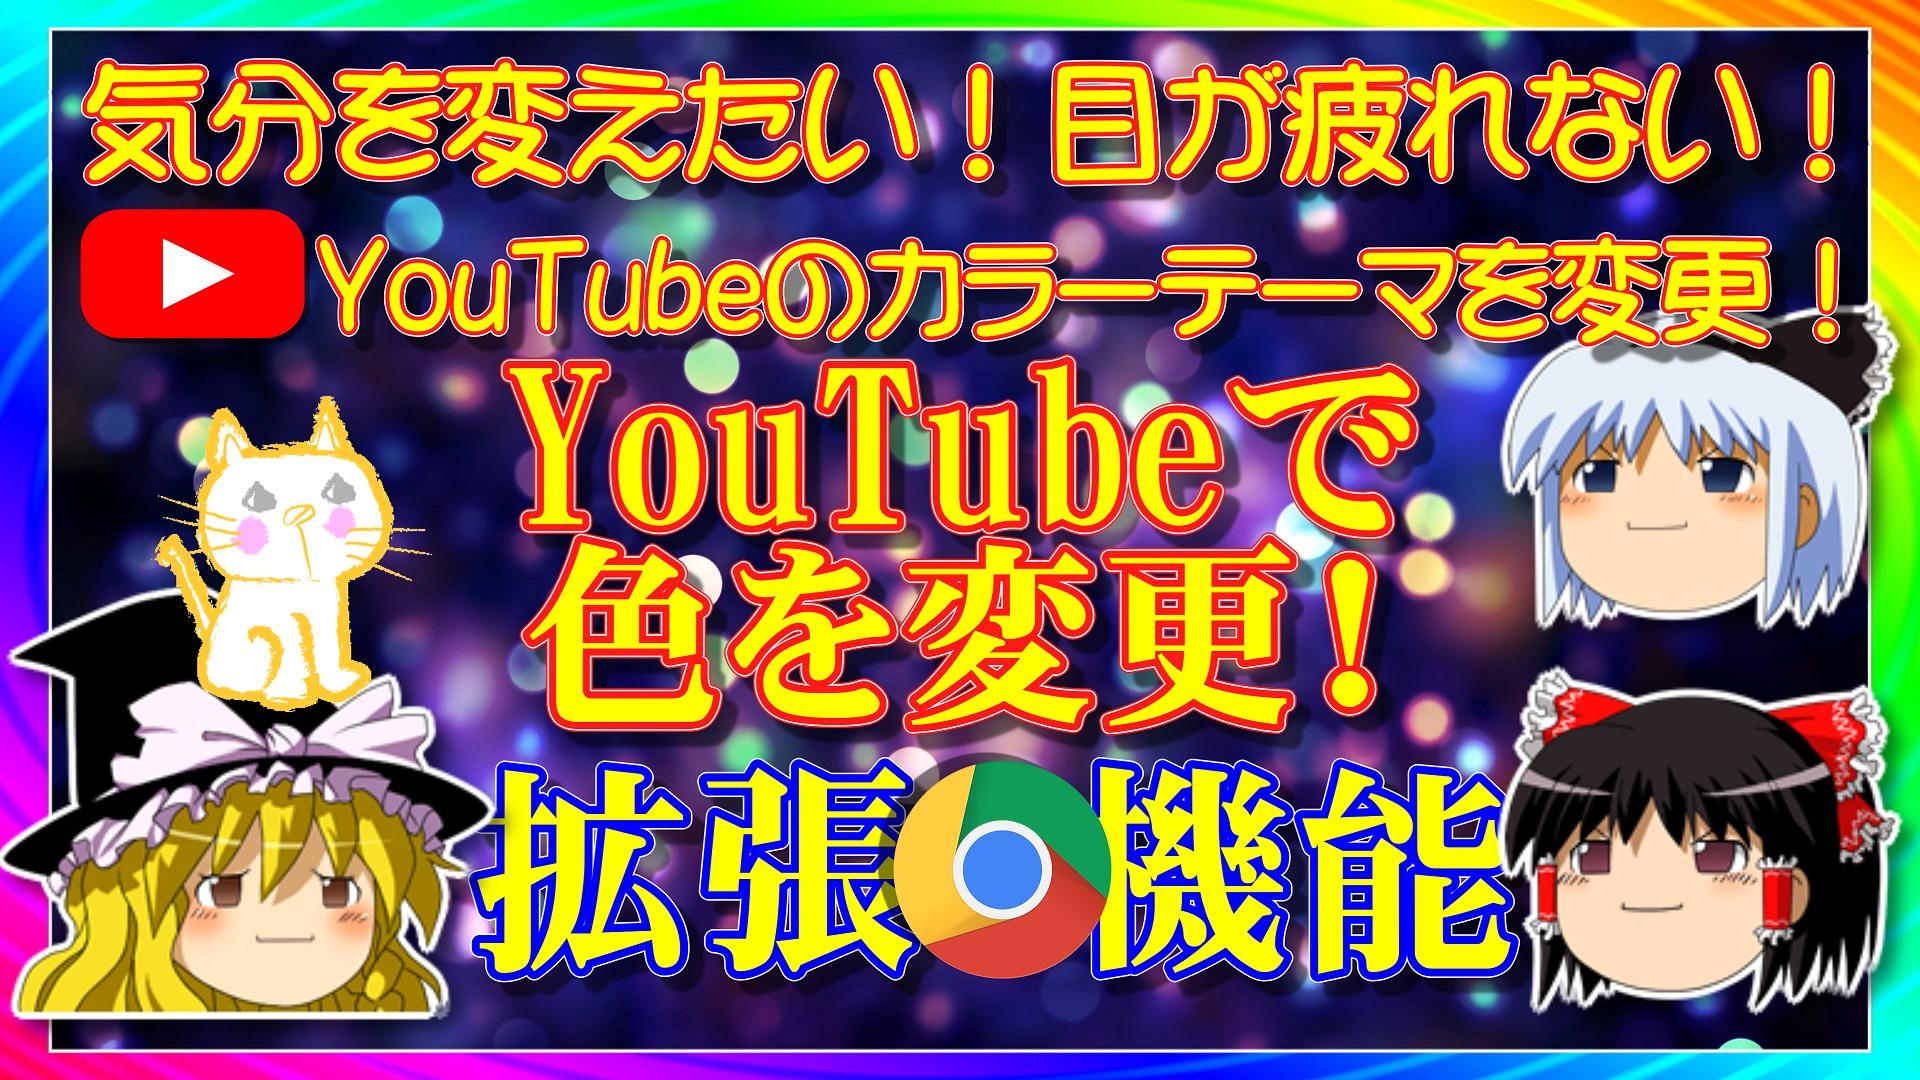 YouTubeのカラーテーマを変更するCHROME拡張機能_color_change_for_youtube